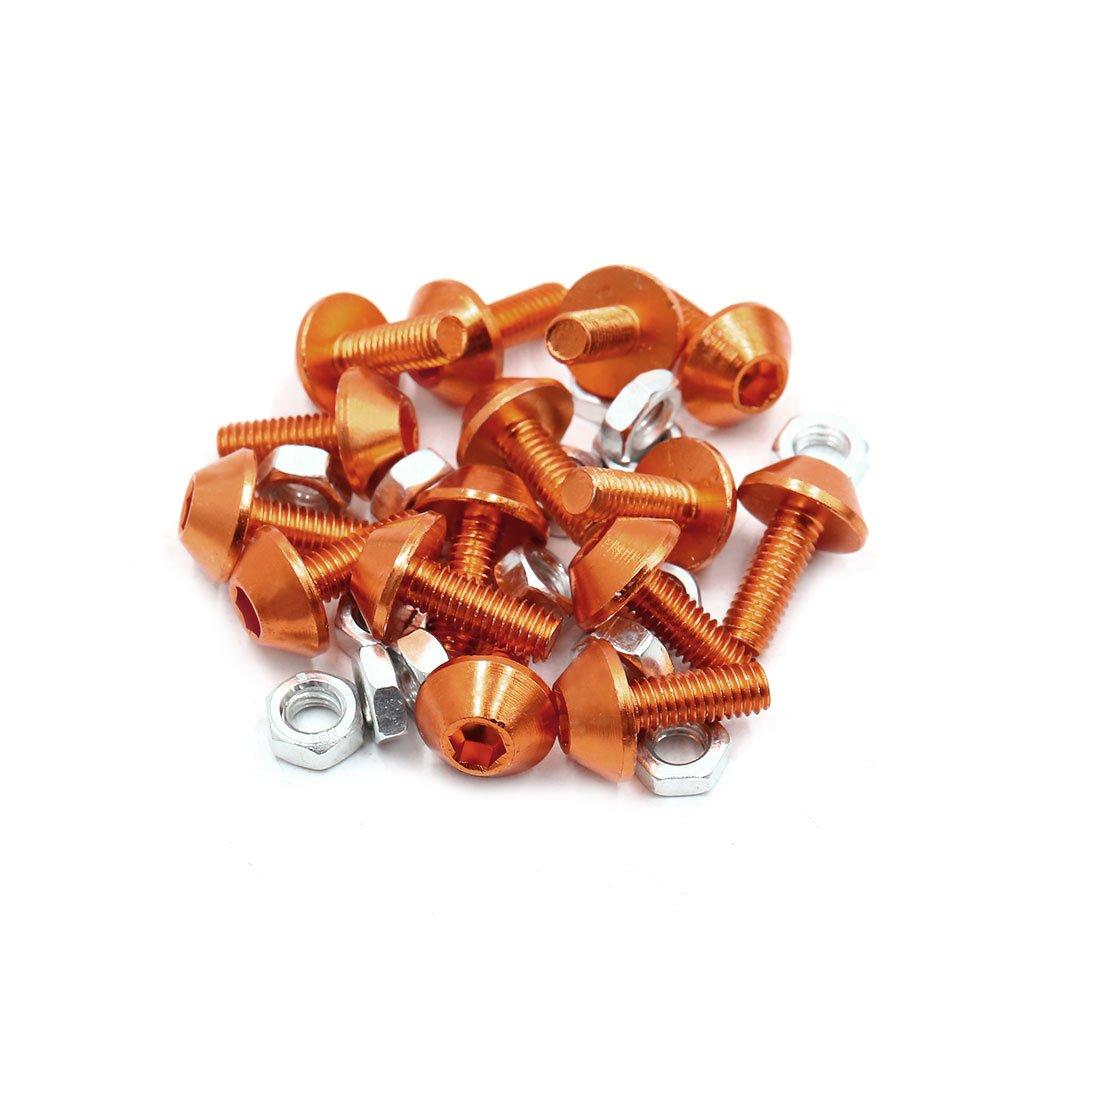 uxcell 15Pcs M6 Aluminum Alloy Hex Socket Head Motorcycle Bolts Screws Nuts Orange